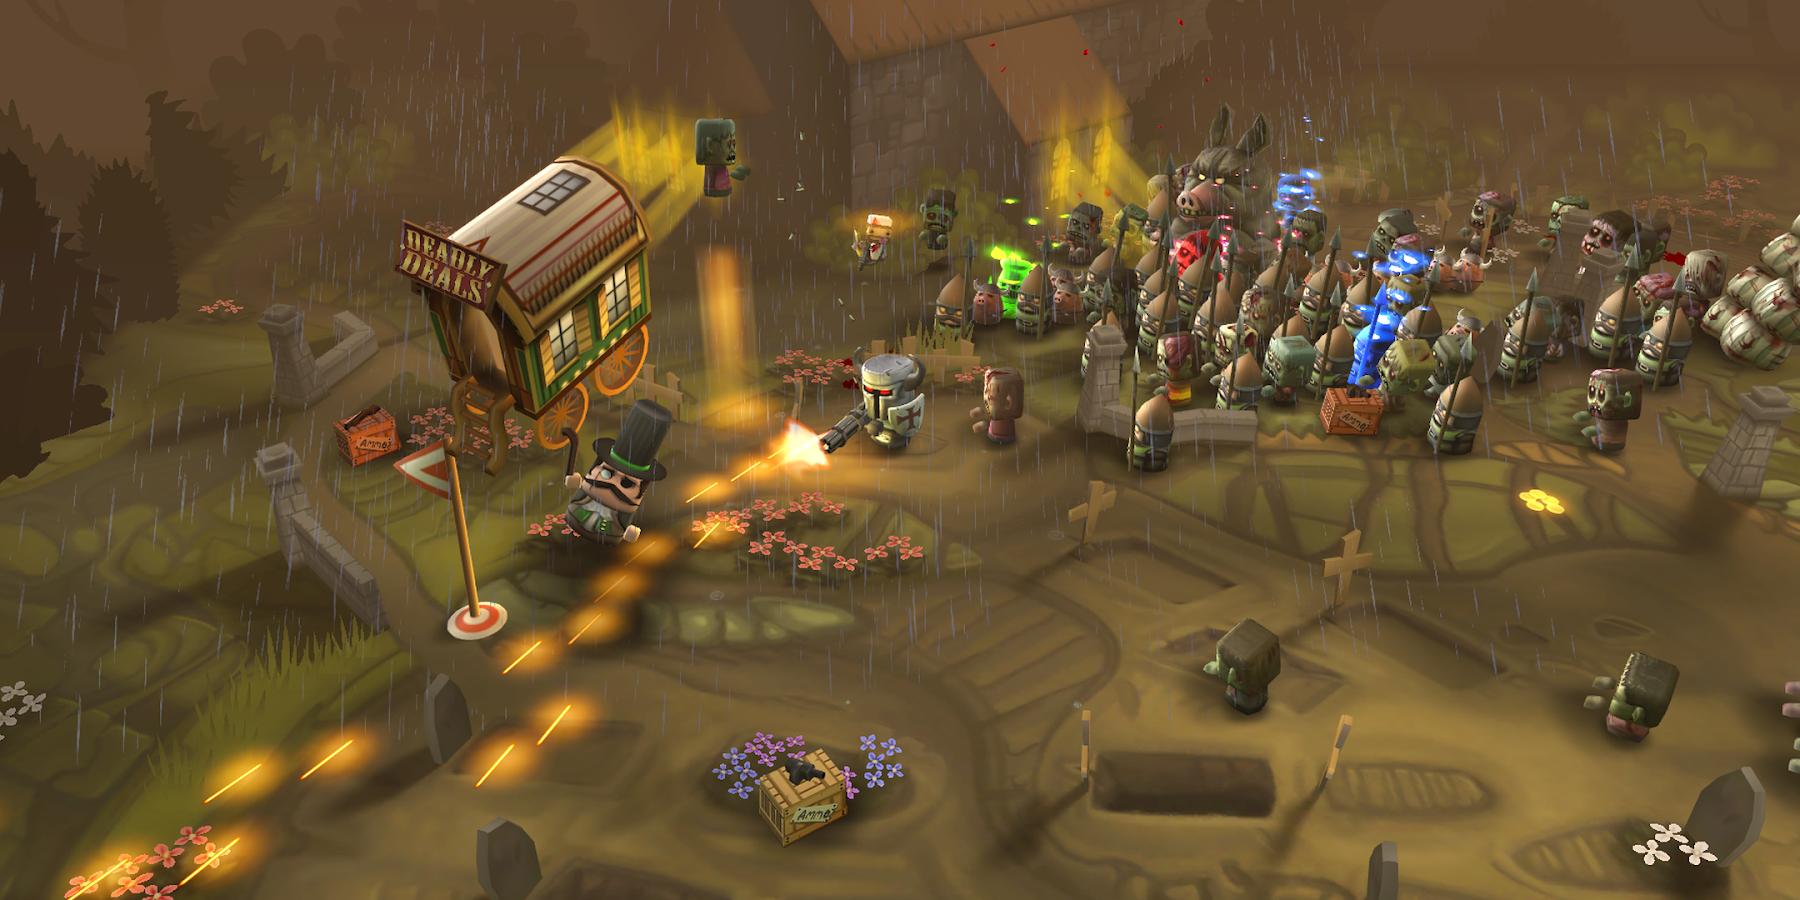 Screenshots of Minigore 2: Zombies for iPhone